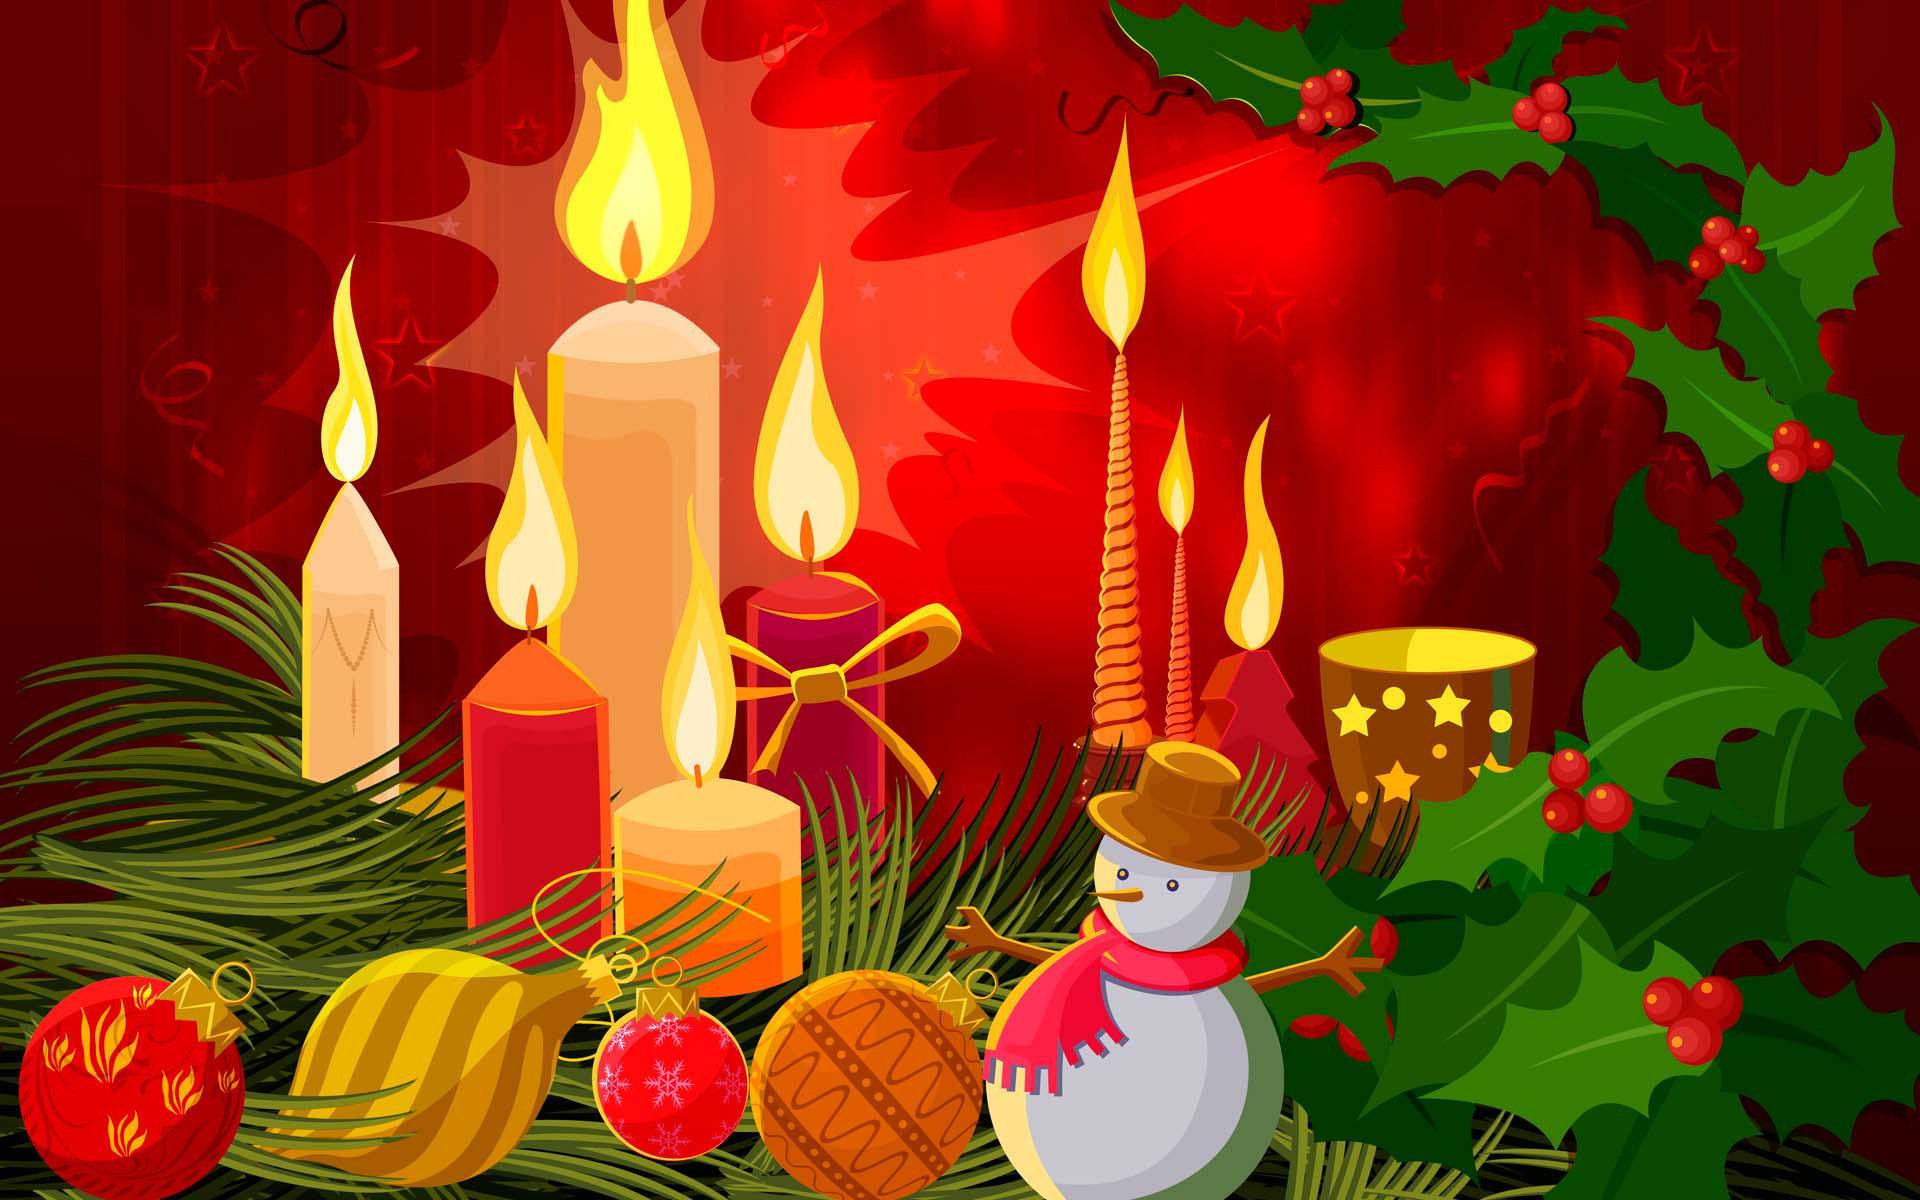 Christmas candle hd wallpaper   Choice Wallpaper Choice 1920x1200